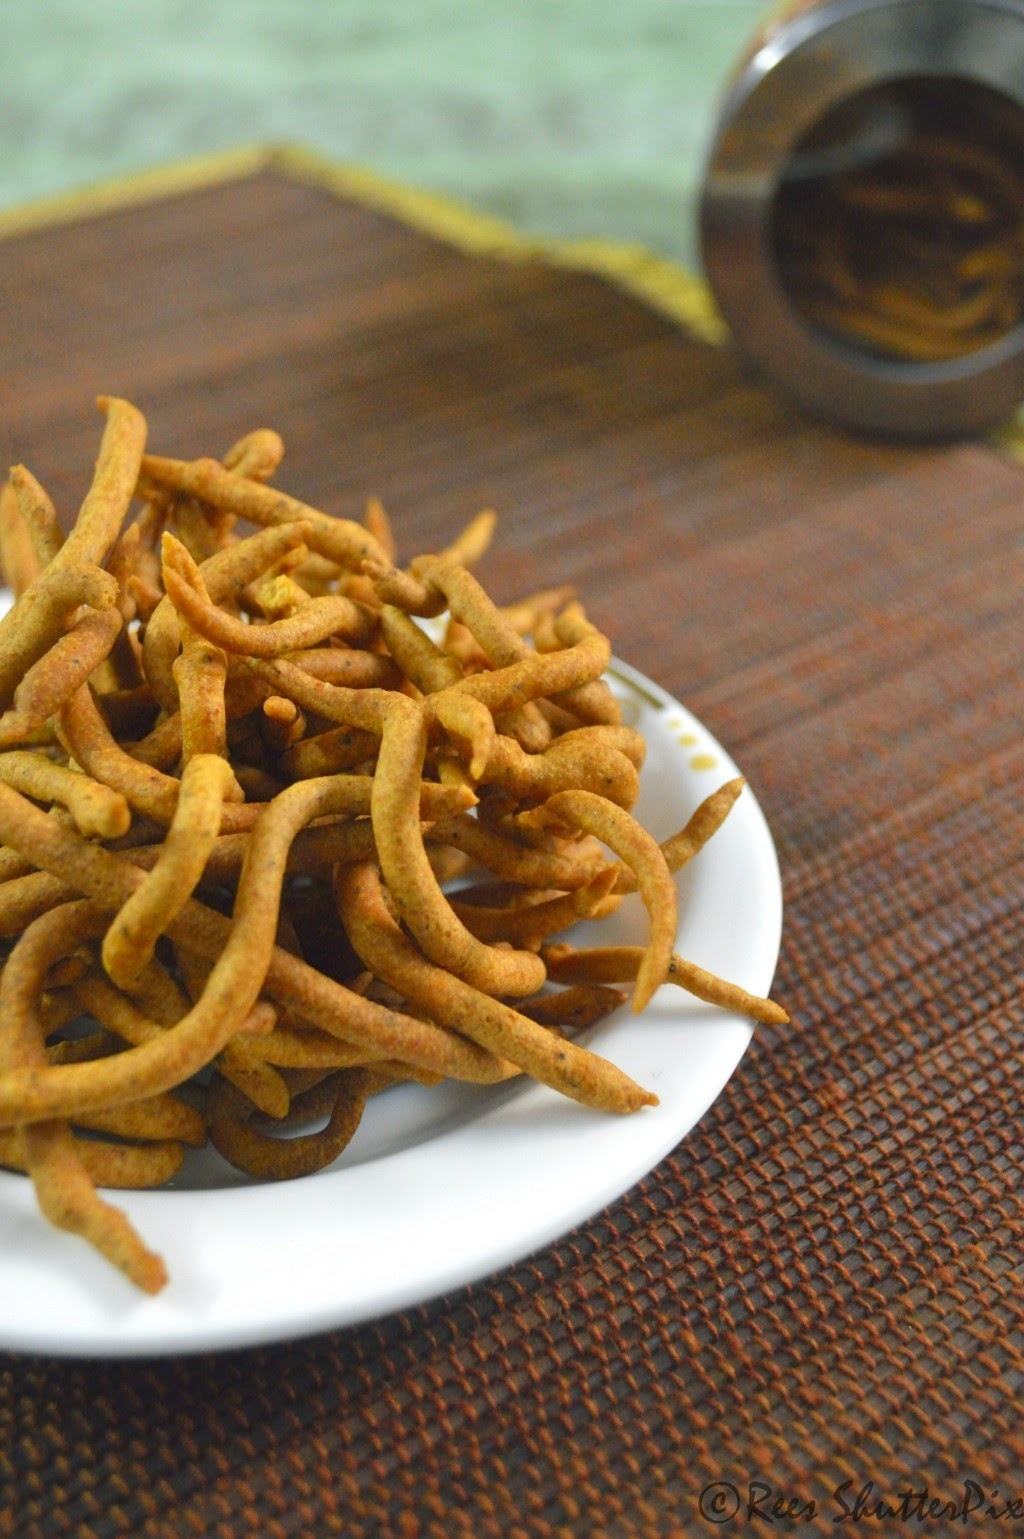 Festive Snacks, Savoury Snacks, Diwali Snacks Recipes, kara sev recipe,Indian Snacks, diwali special preparation,easy kara sev recipe, fail proof kara sev recipe, spicy garlic kara sev recipe, sev recipe, easy sev recipe , fried foods, snacks recipes, how to make kara sev at home, sattur kara sev recipe